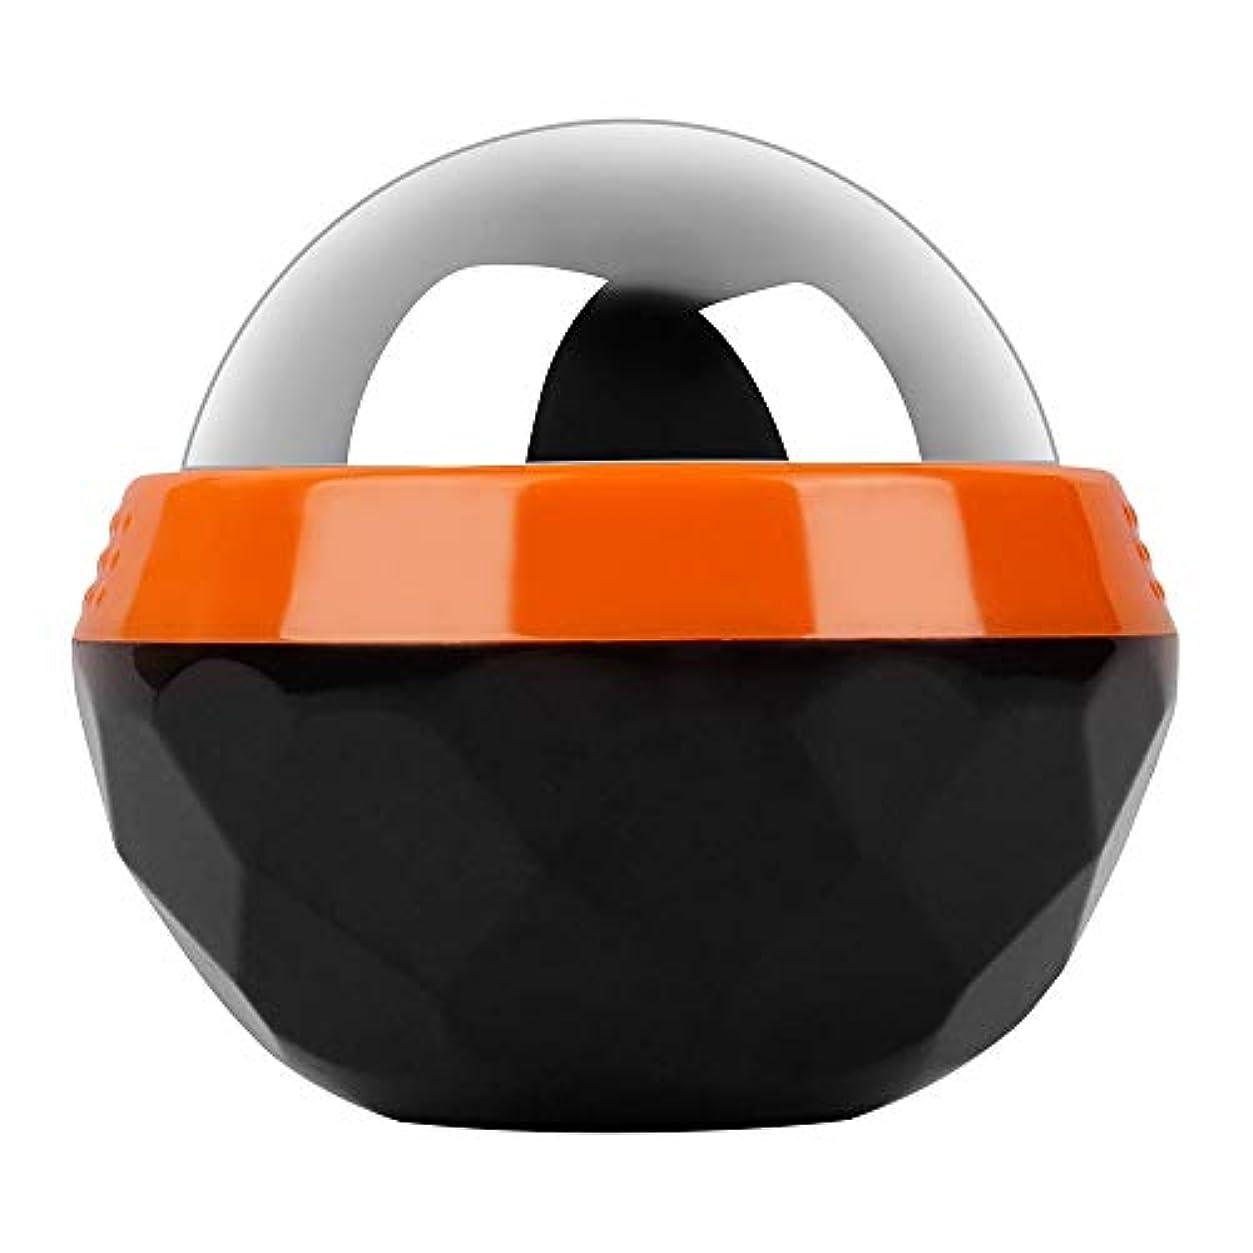 GeTooコールドマッサージローラーボール-2.4インチの氷球は6時間冷たさを持続、アイスセラピーディープティッシュマッサージ、オレンジとブラック